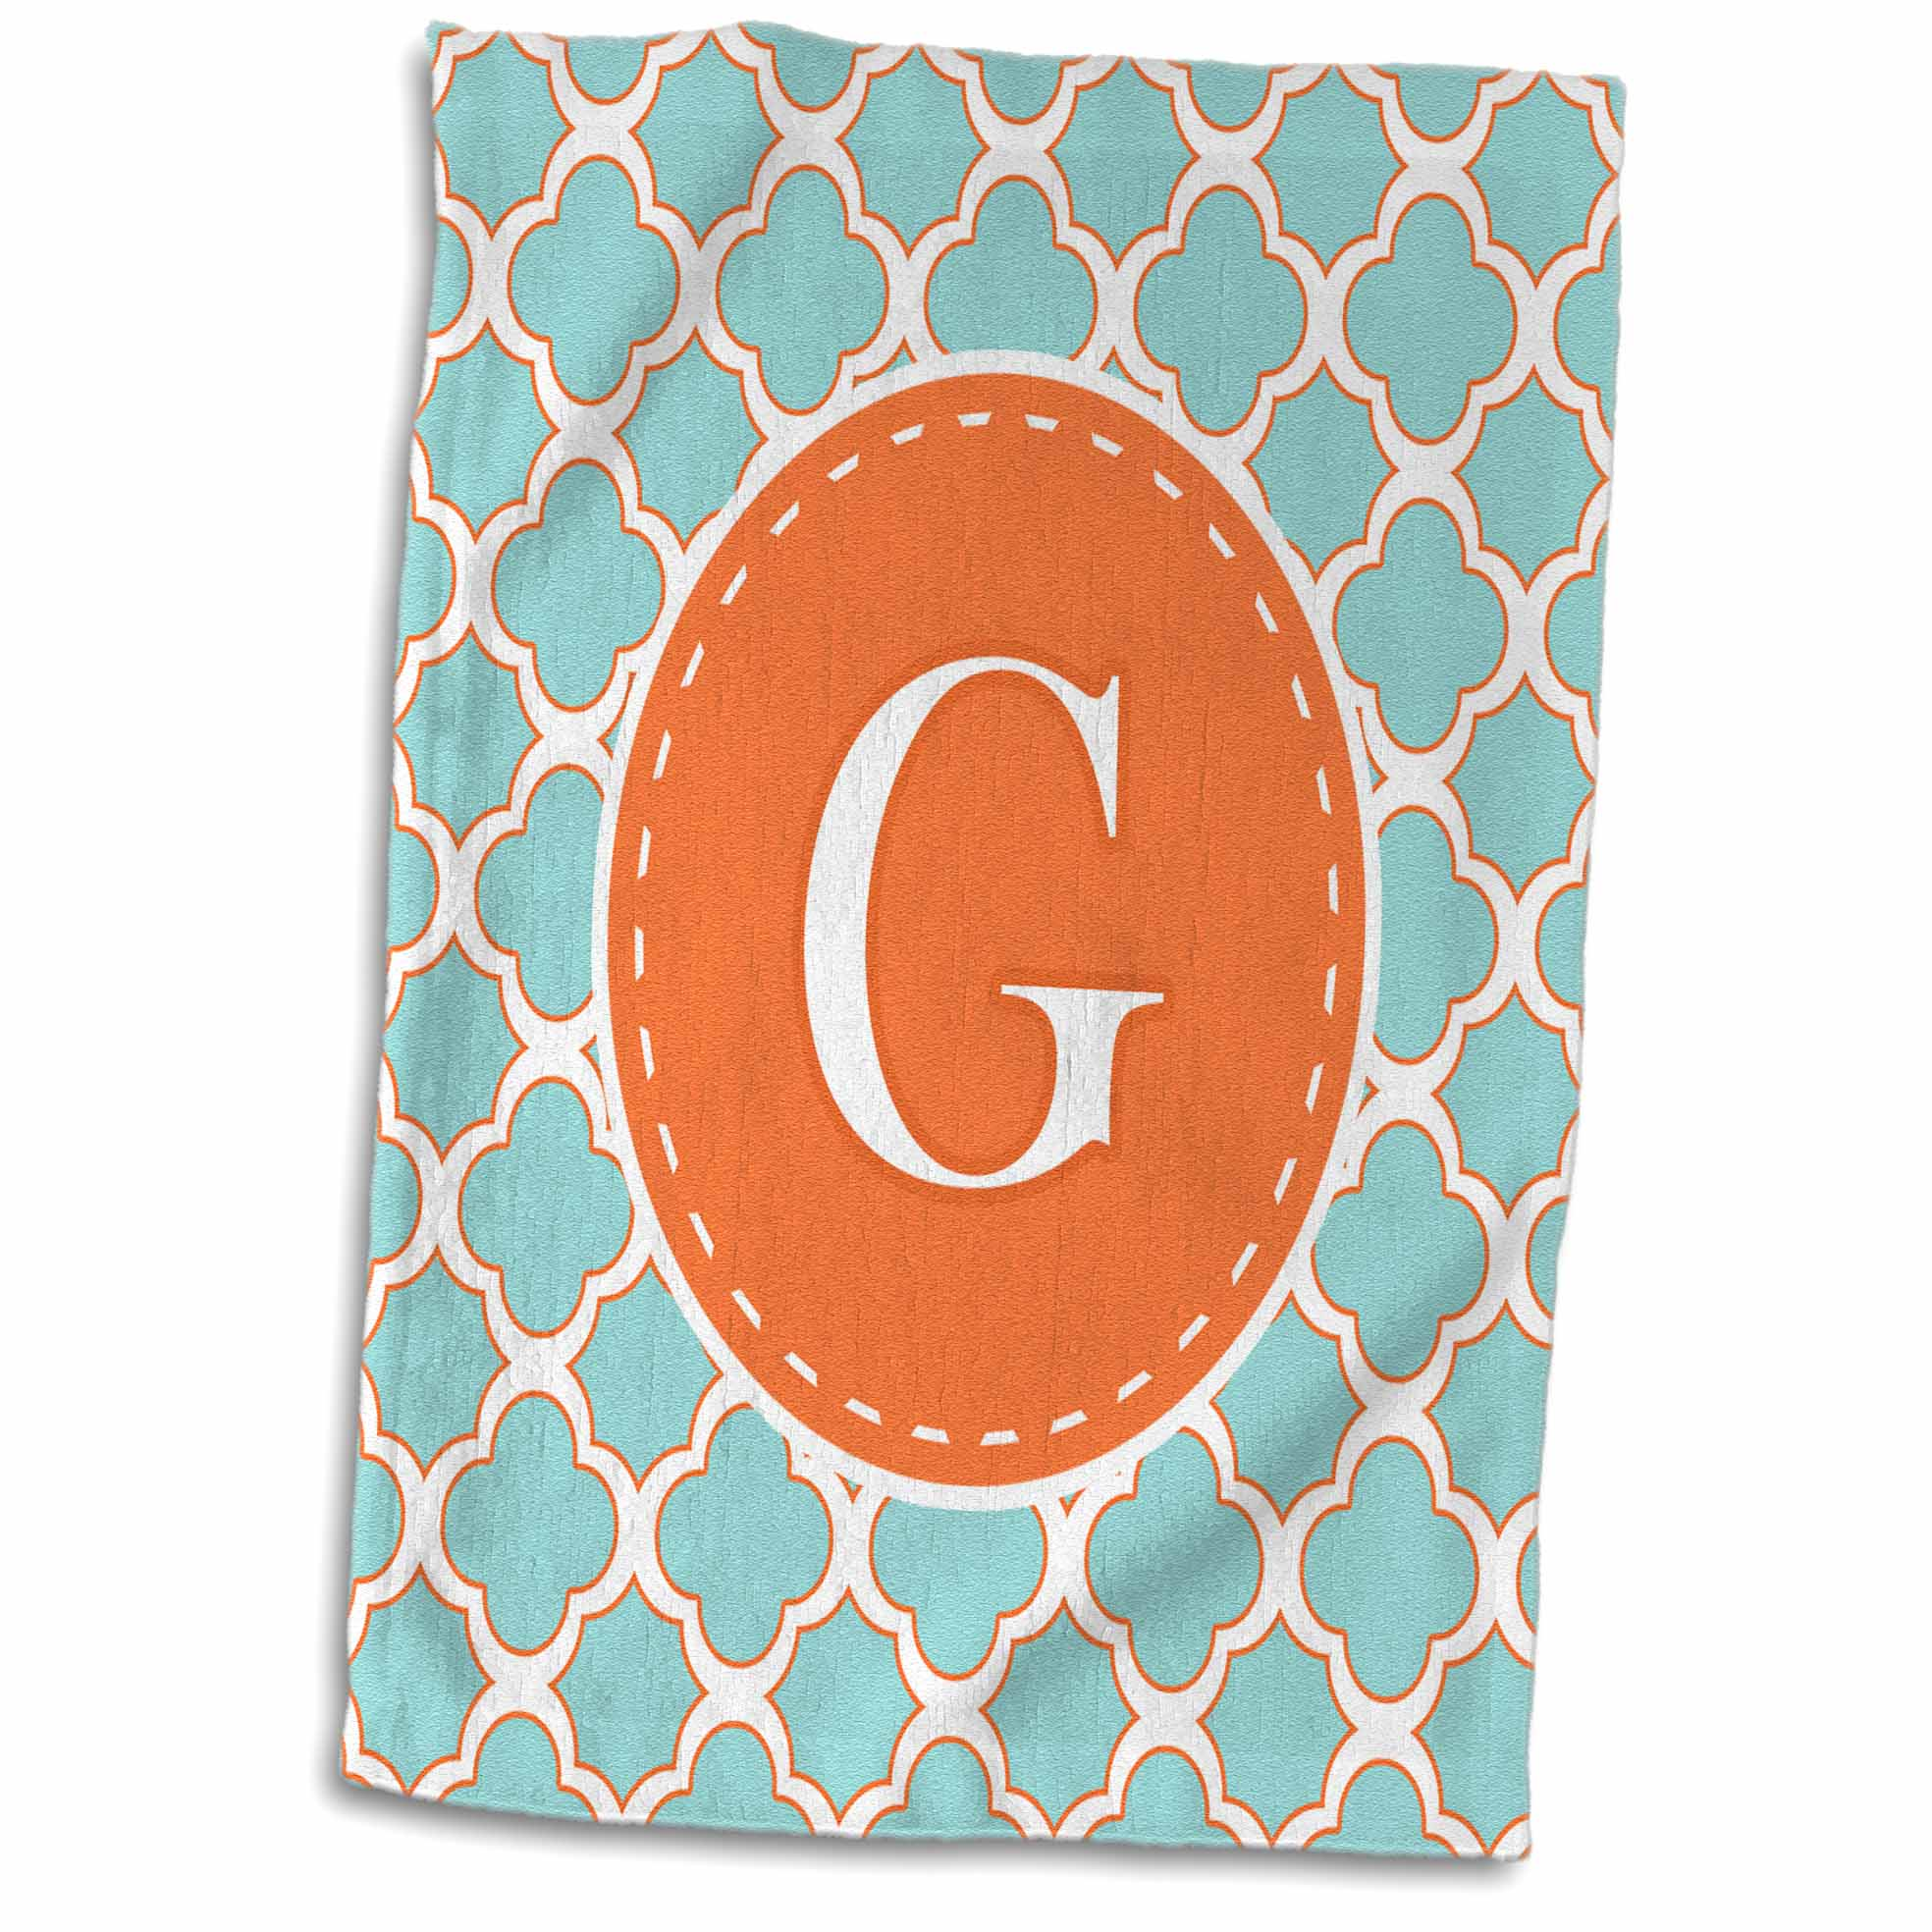 3dRose Letter G Monogram Orange and Blue Quatrefoil Pattern - Towel, 15 by 22-inch